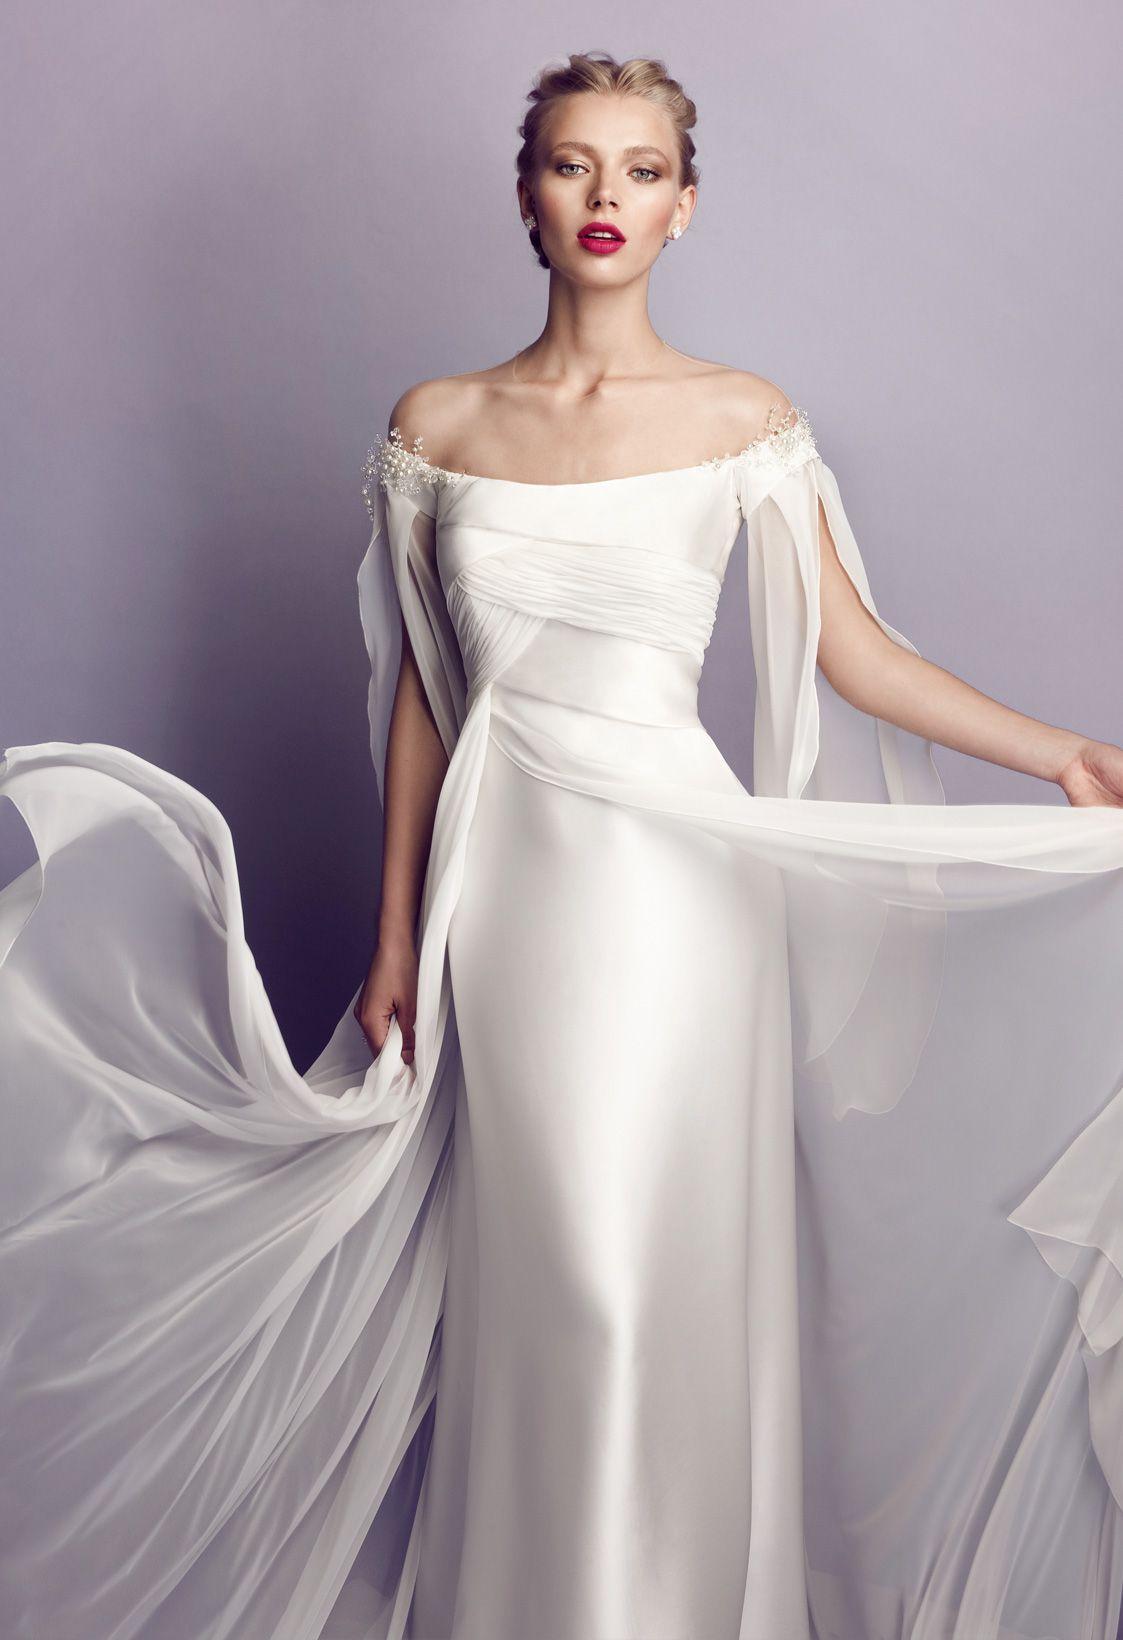 best service 87c9b 19f84 Collezioni di abiti da sposa a Roma Elvira Gramano | Wedding ...